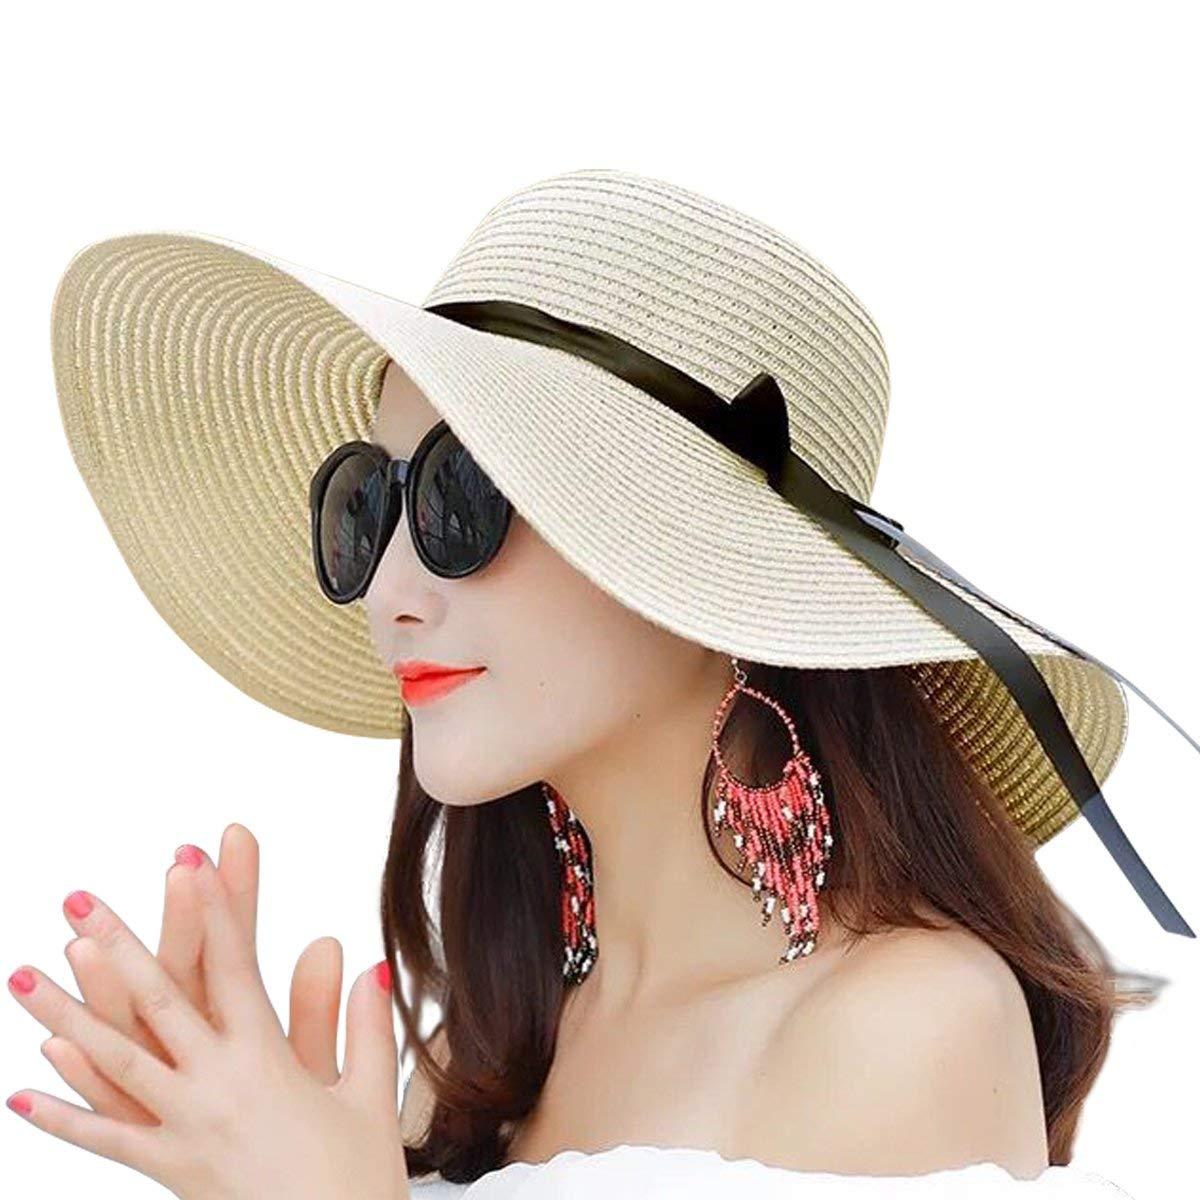 CDM product Women Summer Big Brim Beach Hat Floppy Foldable Bowknot Straw Sun Hat big image